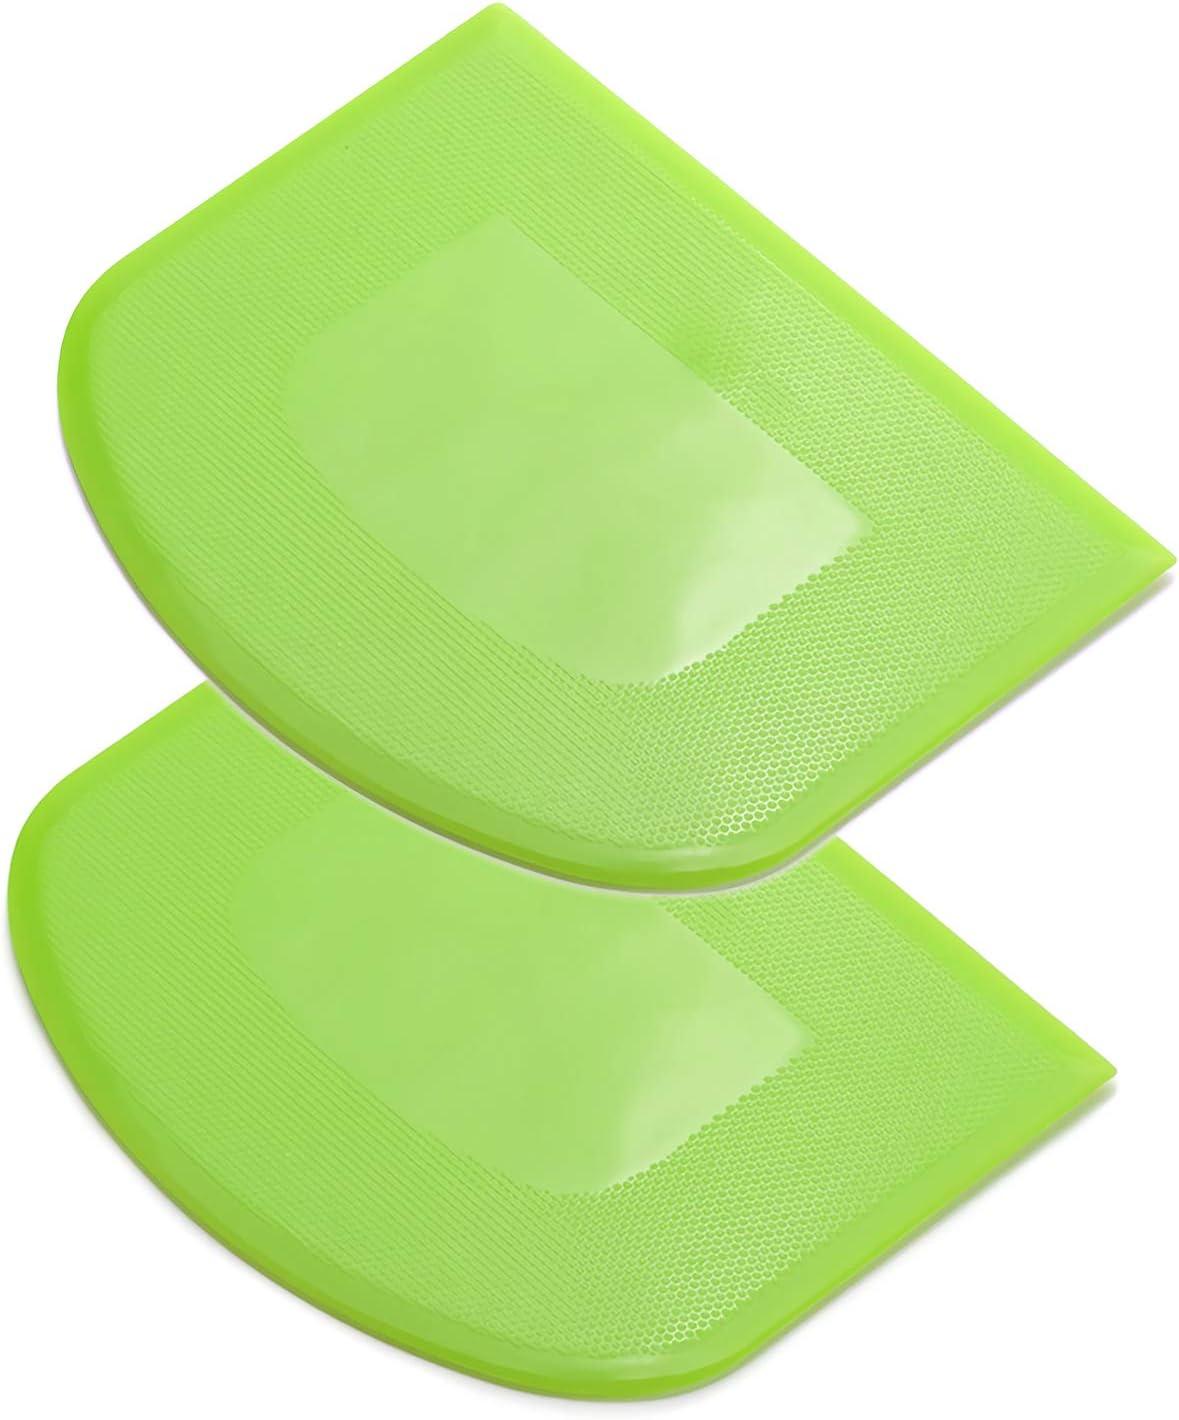 Elastic plastic scraper practical bench scraper multifunctional food scraper